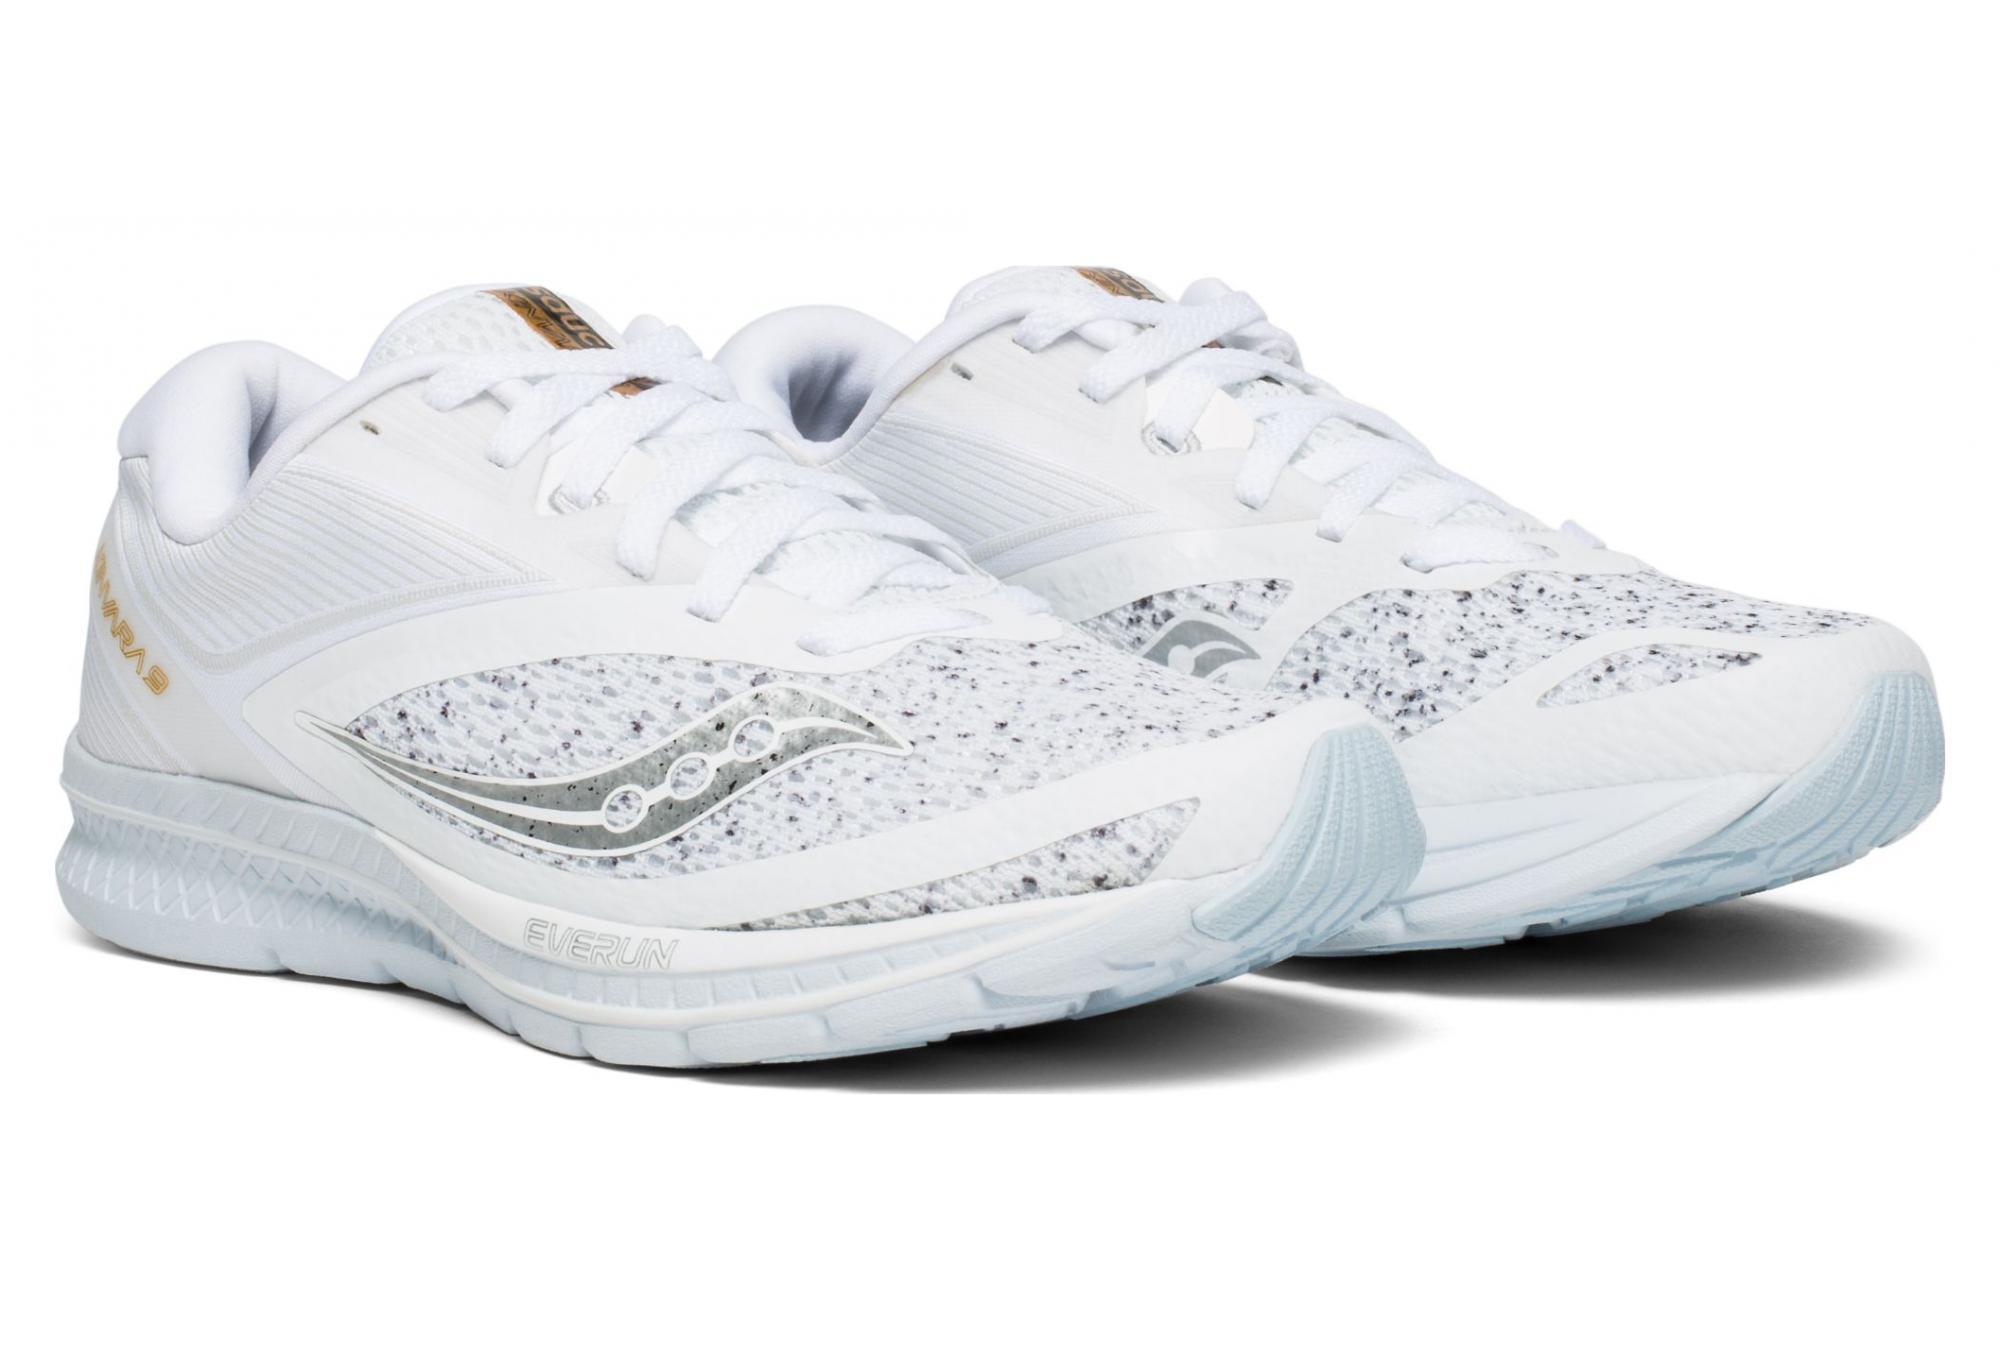 the latest 08a9e b97bd Saucony Kinvara 9 Women's Shoes White Noise